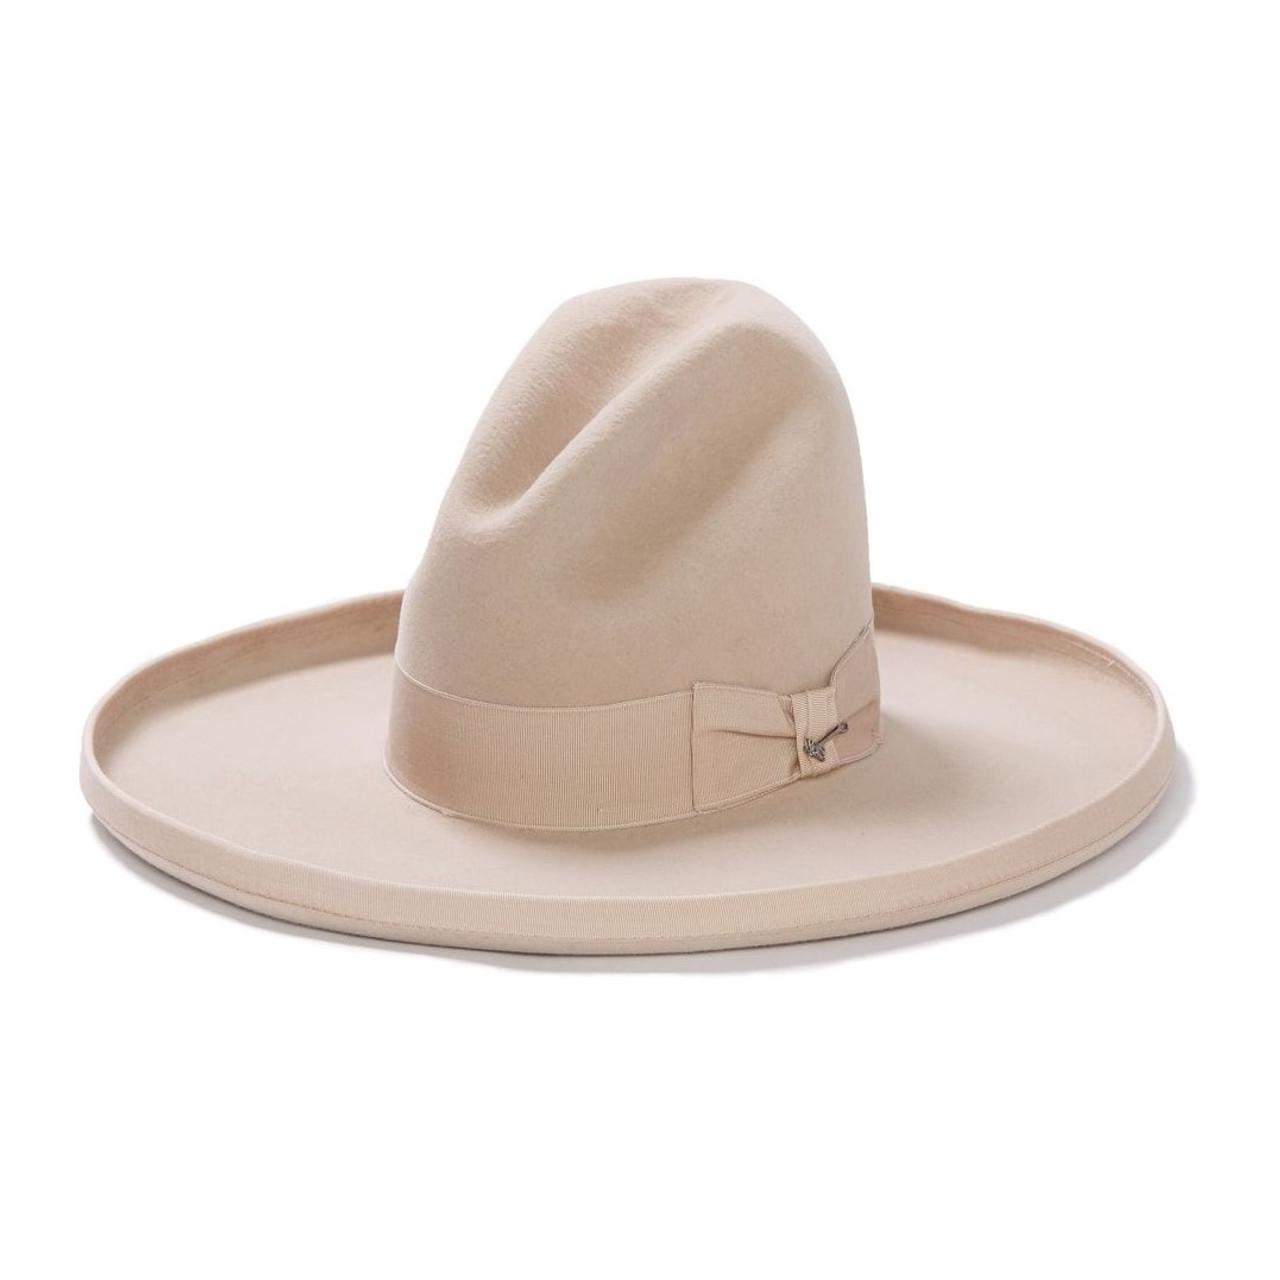 Stetson Felt Hats - Tom Mix - 6x Legendary Collection Cowboy Hat ... 701a832b175